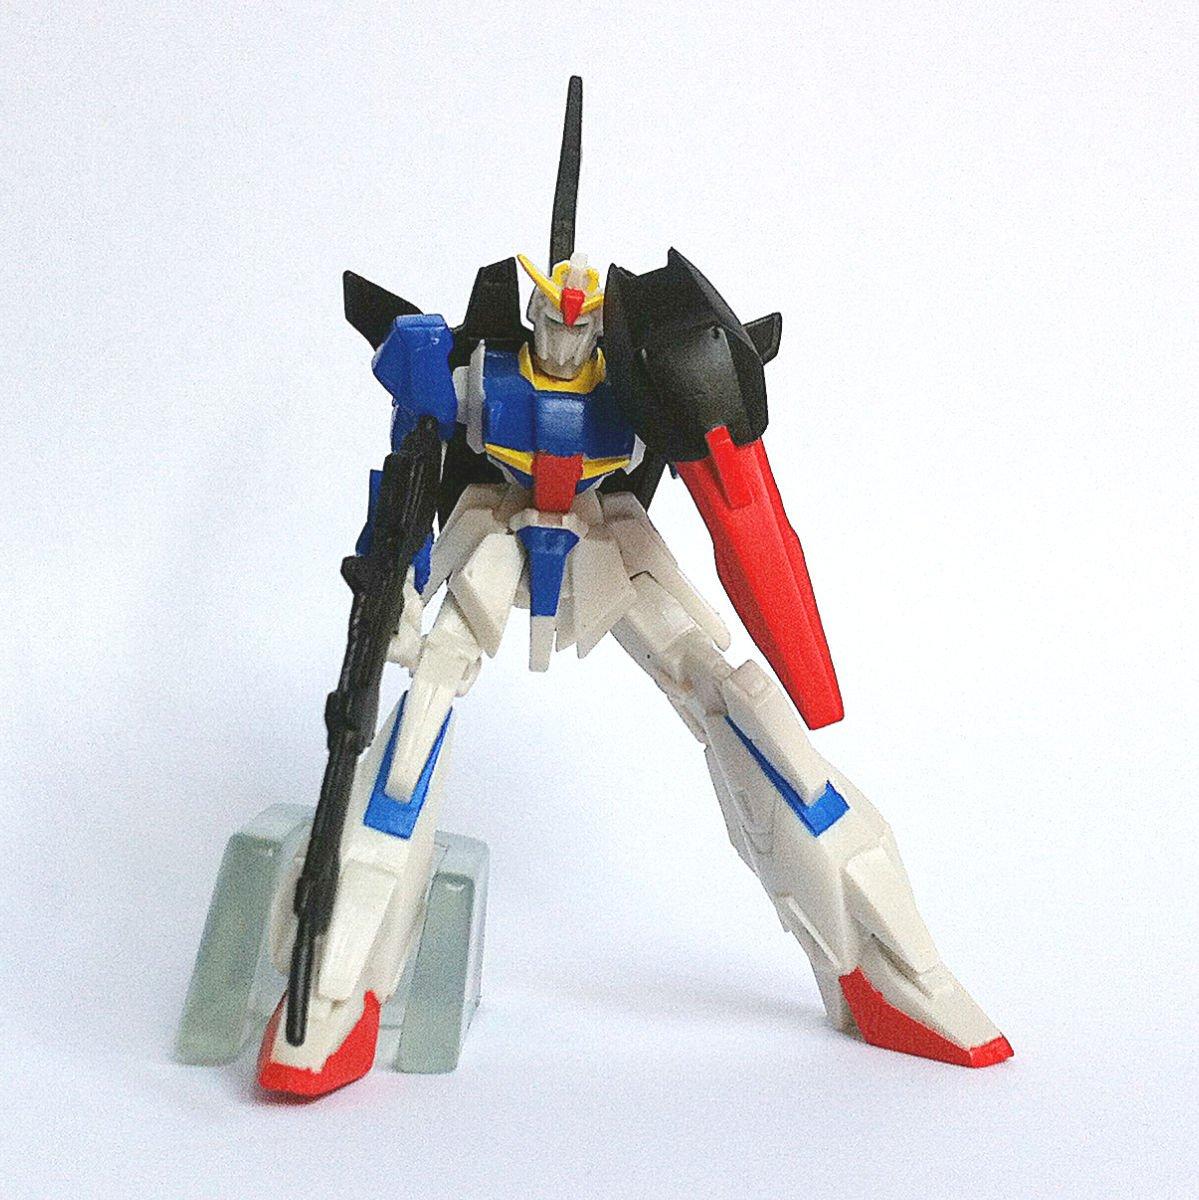 MSZ-006 Zeta Gundam from HG Gundam MS Selection by Bandai